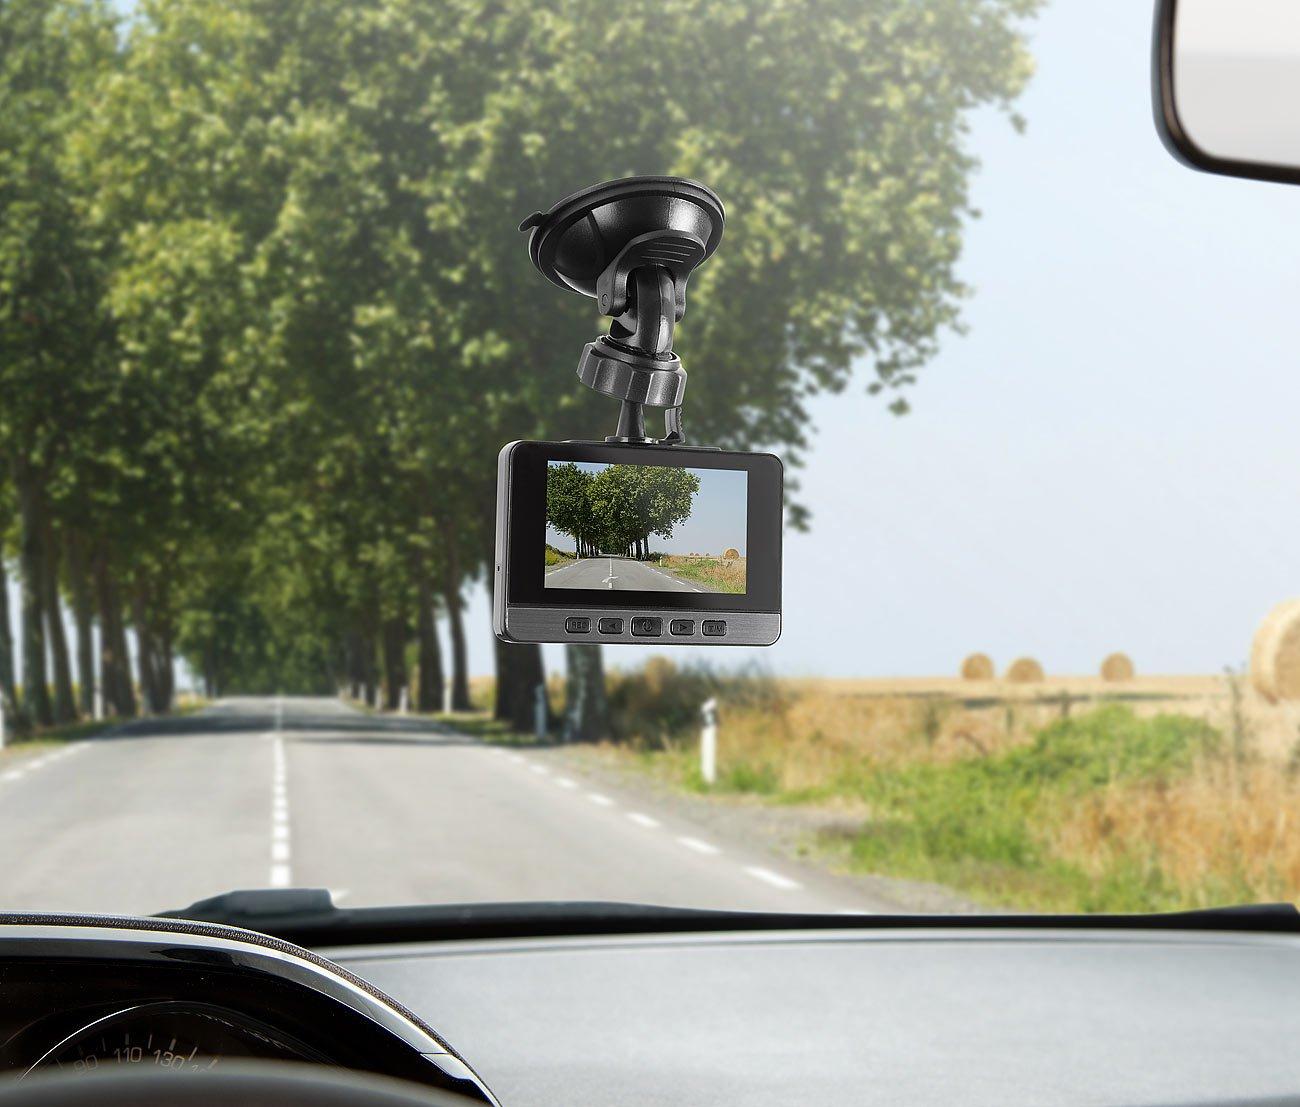 NavGear-Daschcam-Full-HD-Dashcam-mit-autom-Nachtsicht-Modus-G-Sensor-GPS-Empfnger-Car-Camera